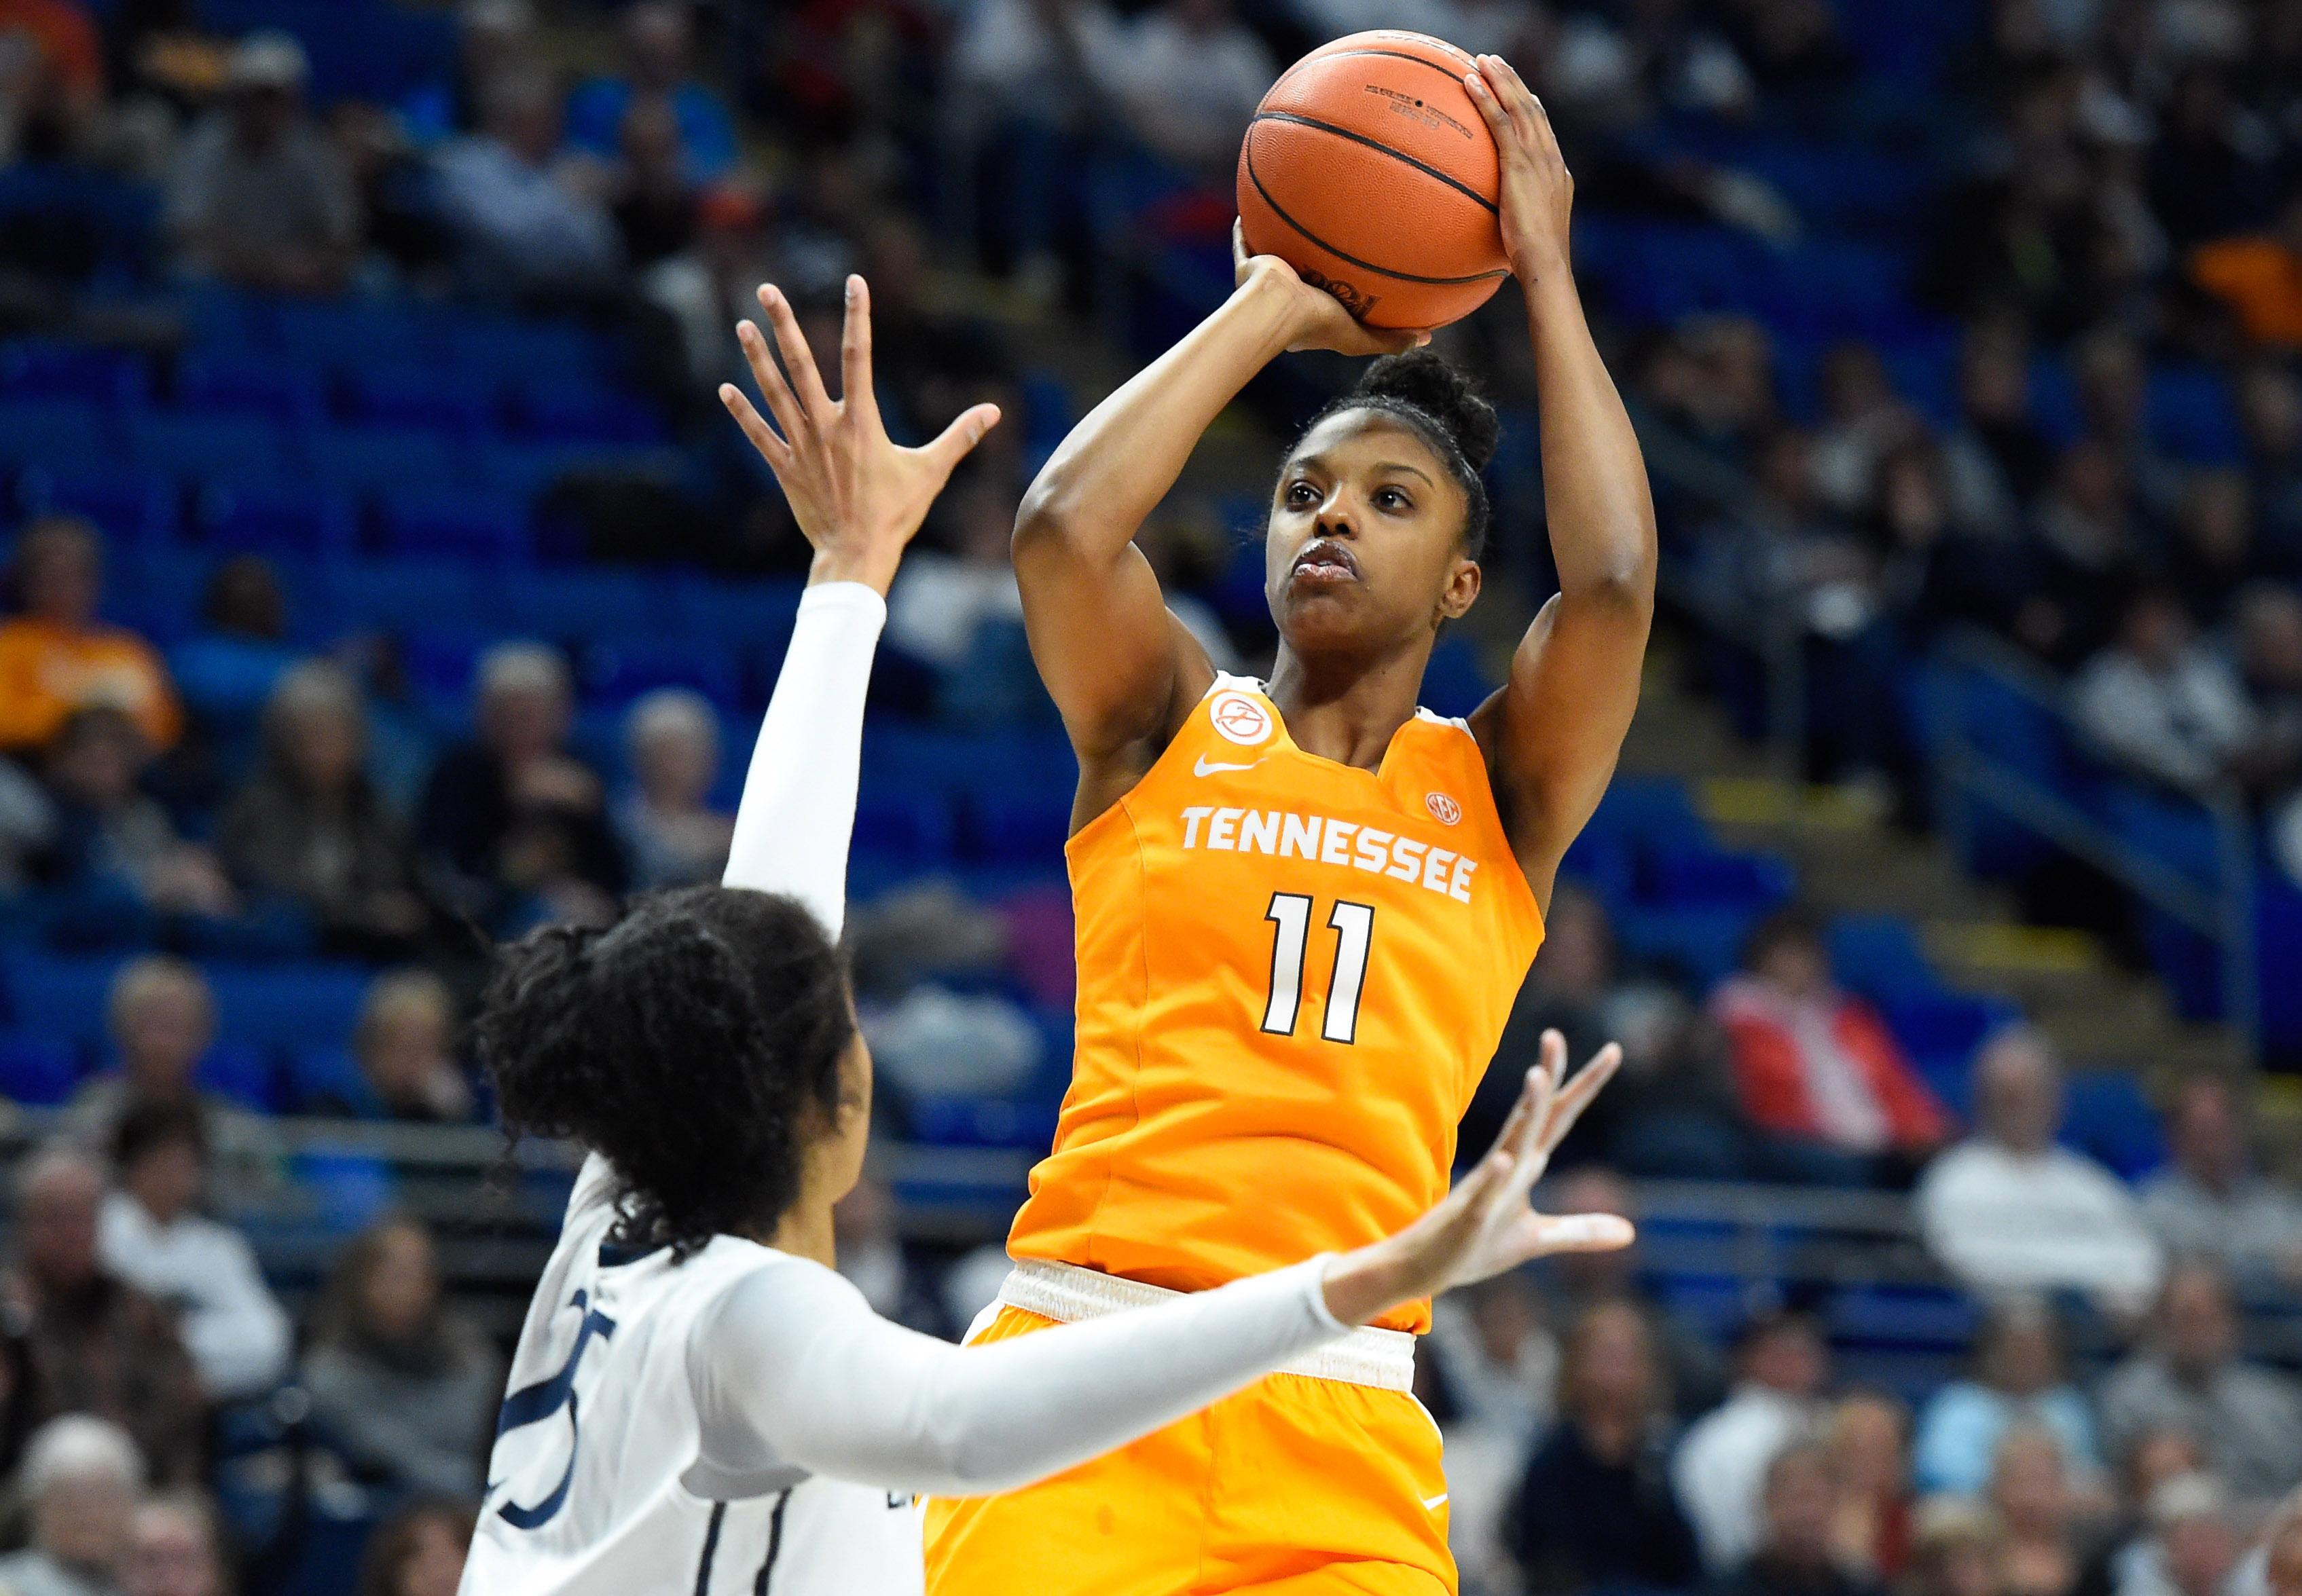 NCAA Womens Basketball: Tennessee at Penn State - Diamond DeShields